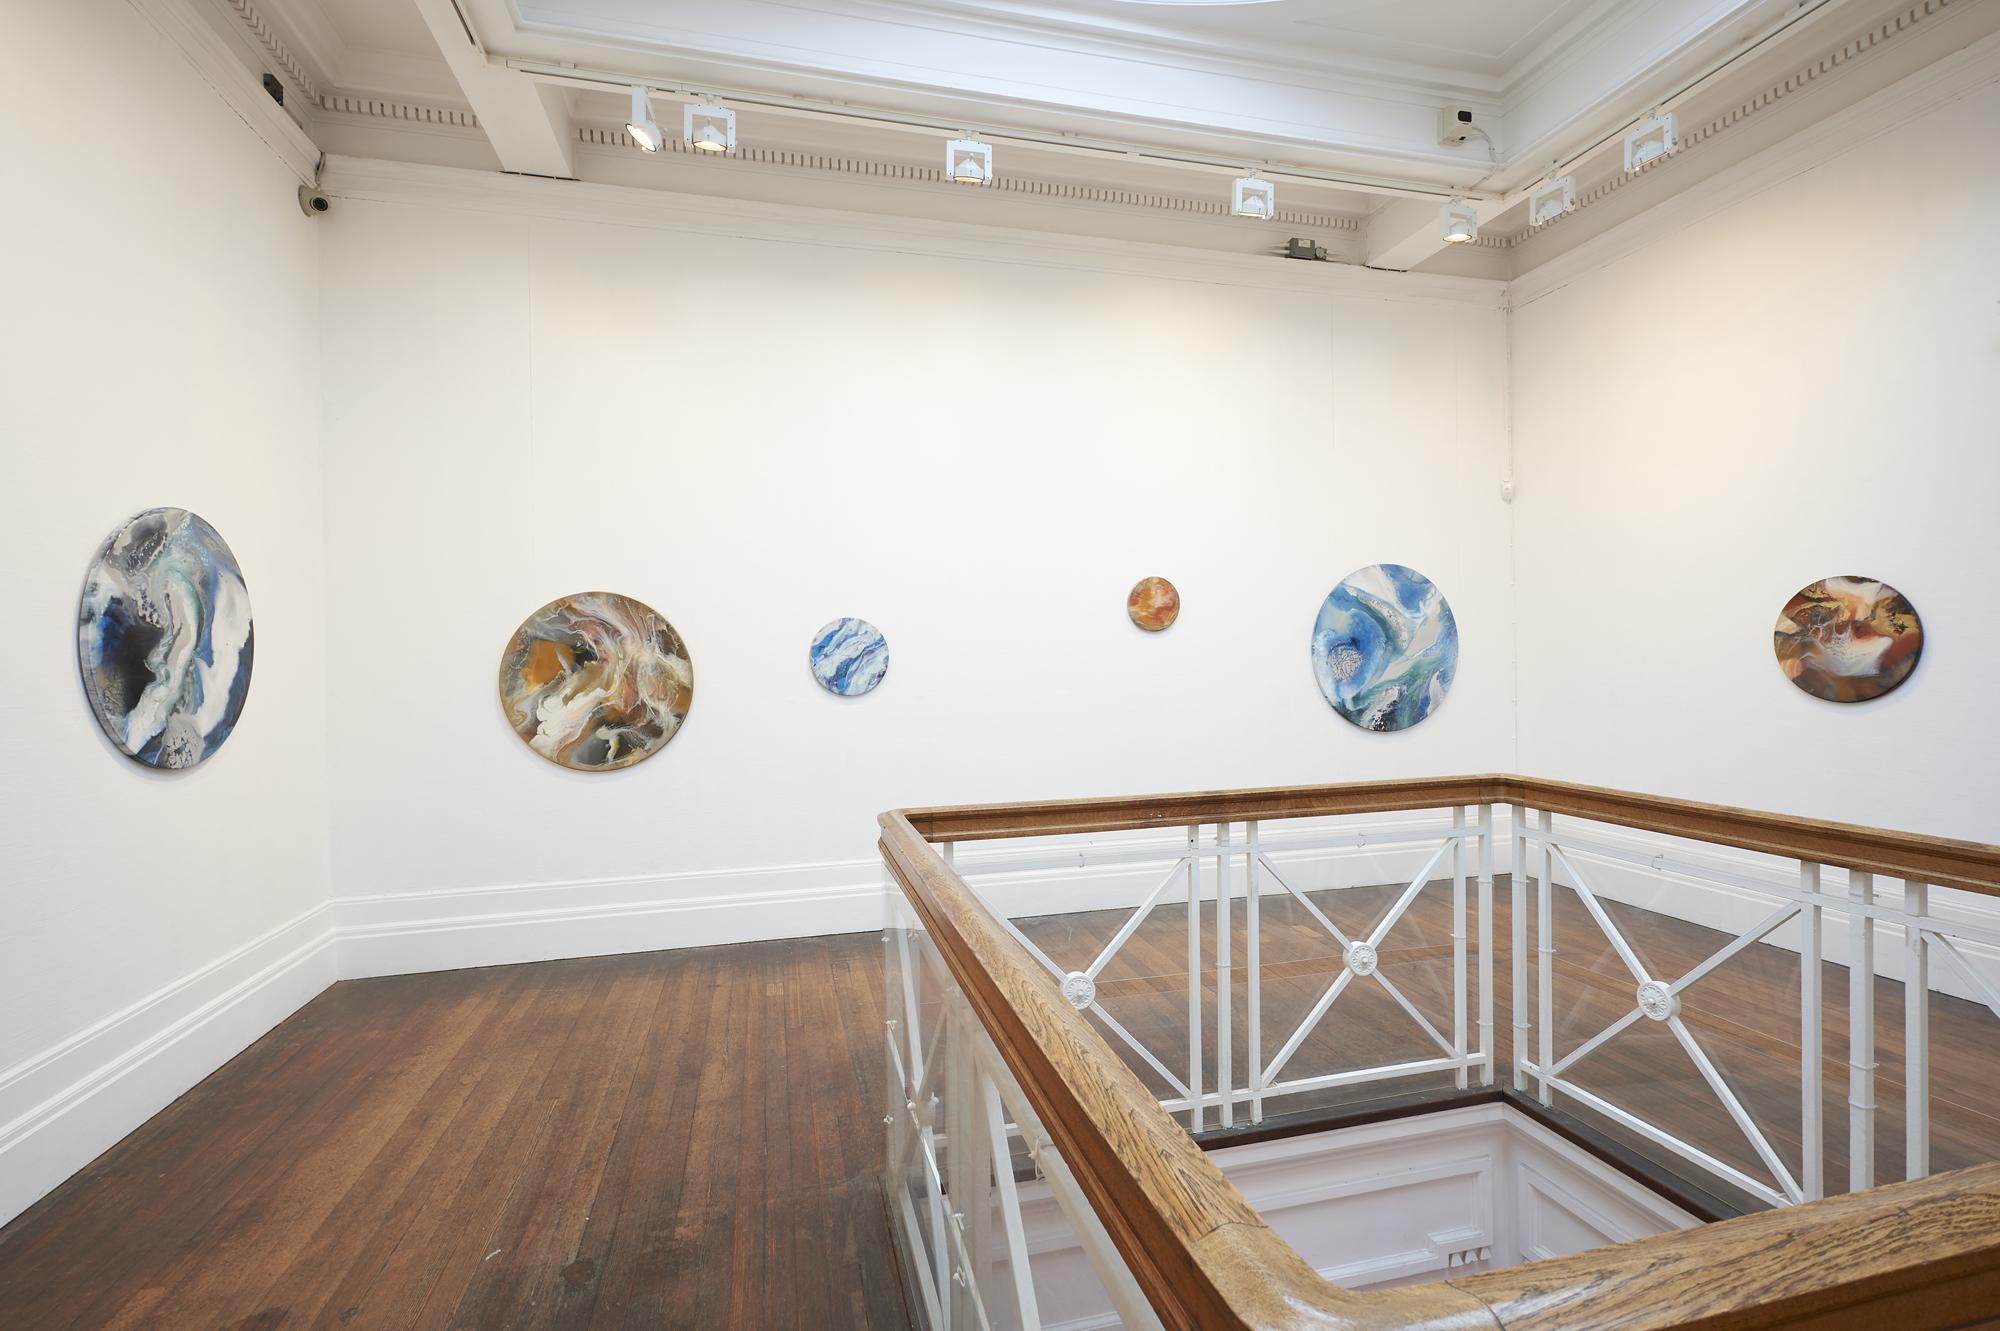 Terraforma, Adrian Pritchard, The Grundy Art Gallery, Blackpool